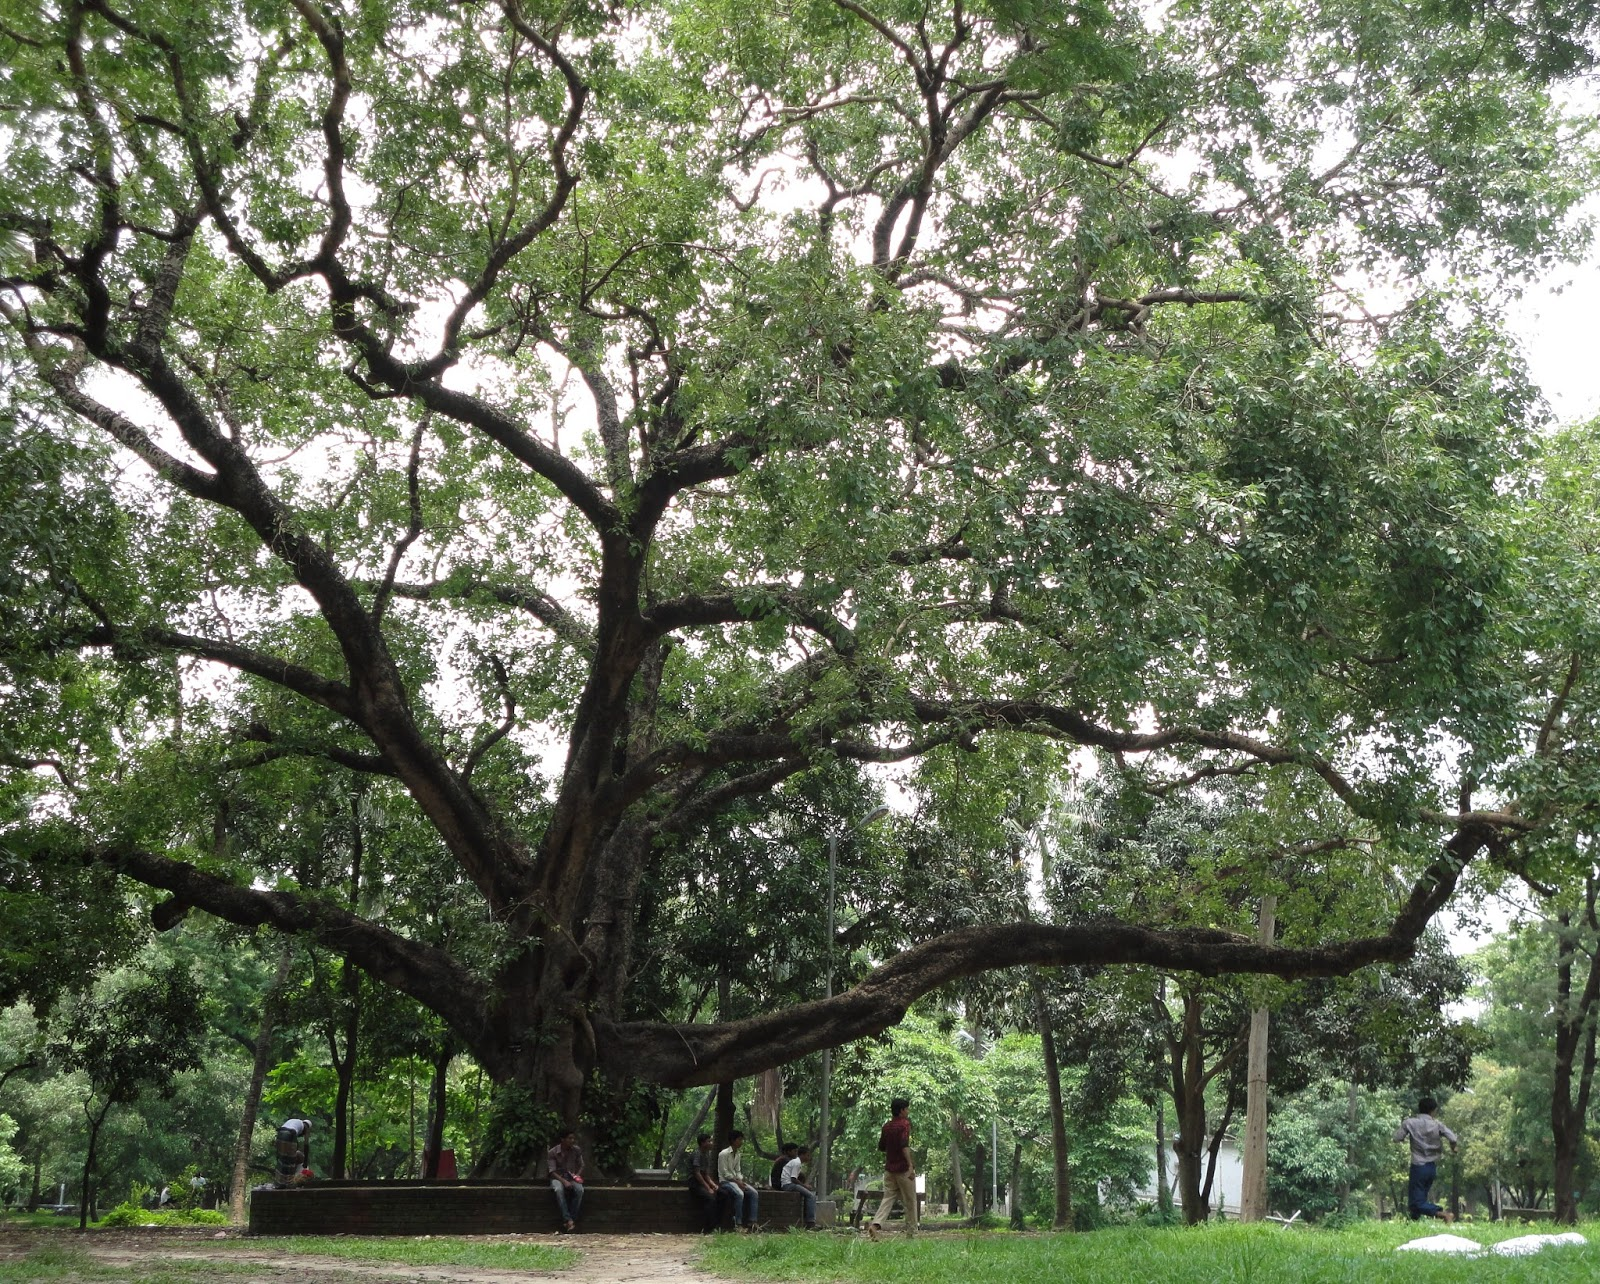 Ashoth, Bodhi Tree, Ficus Religiosa